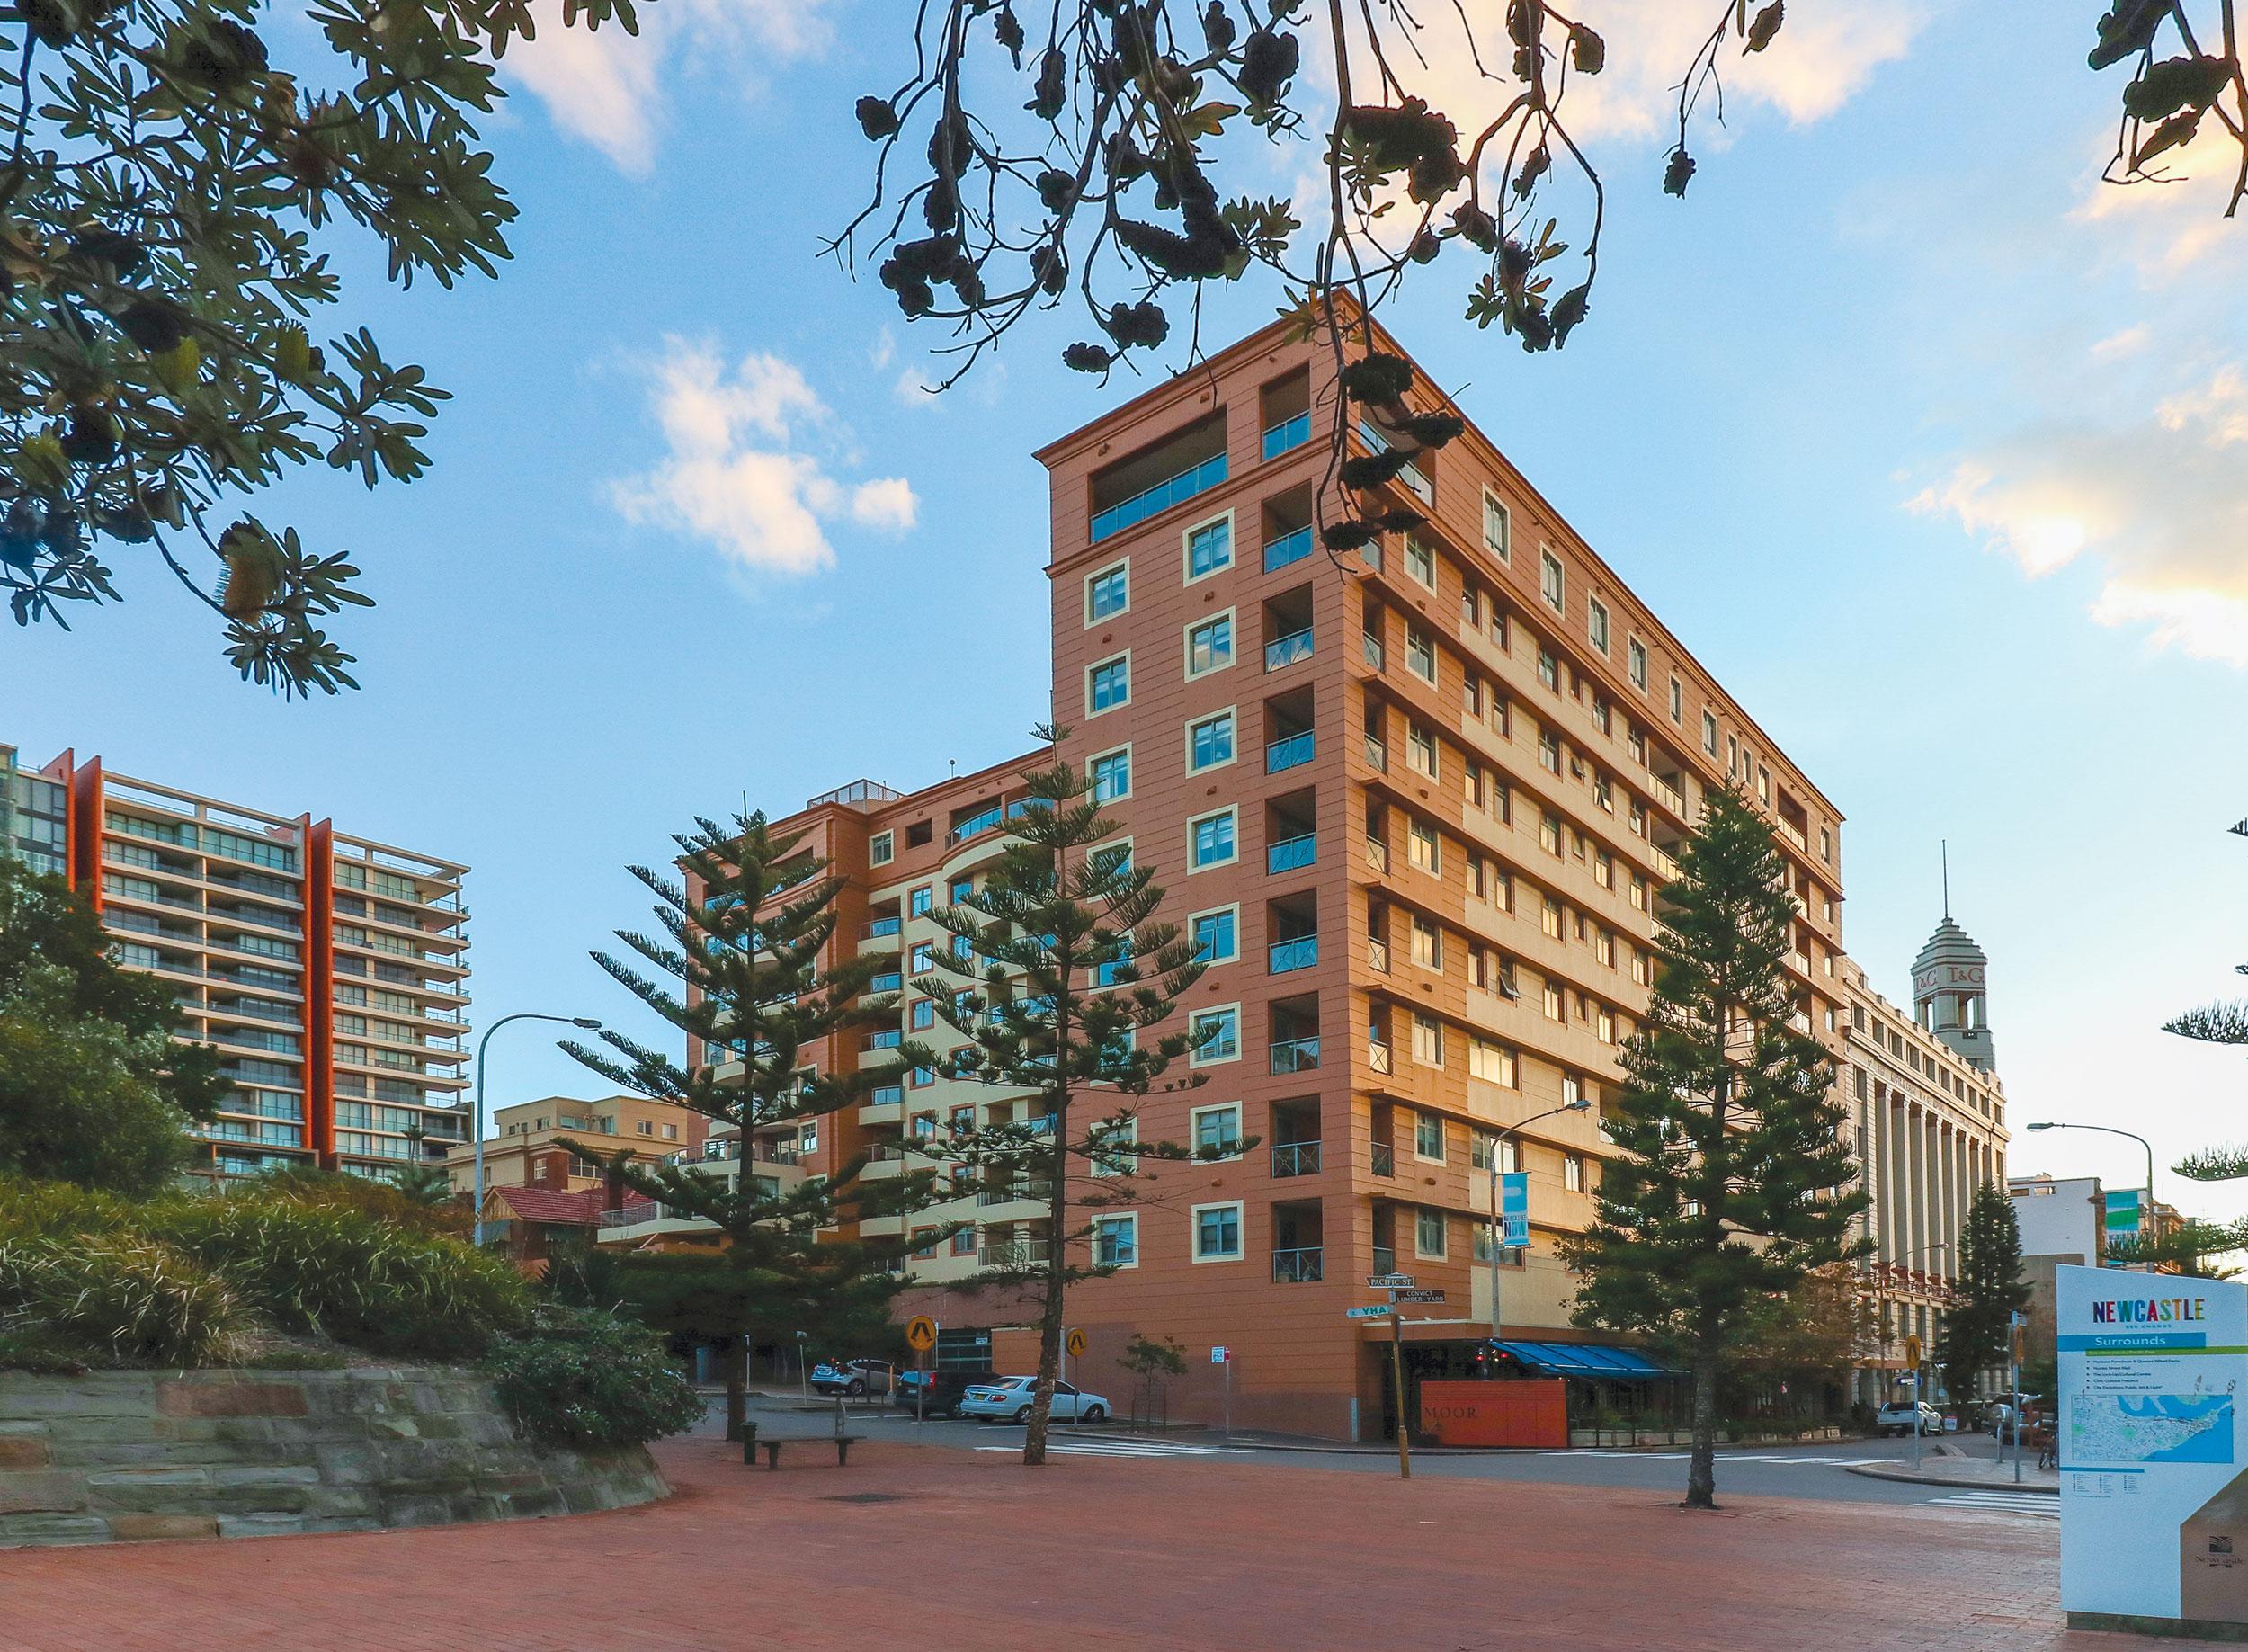 Essington Apartments, Newcastle